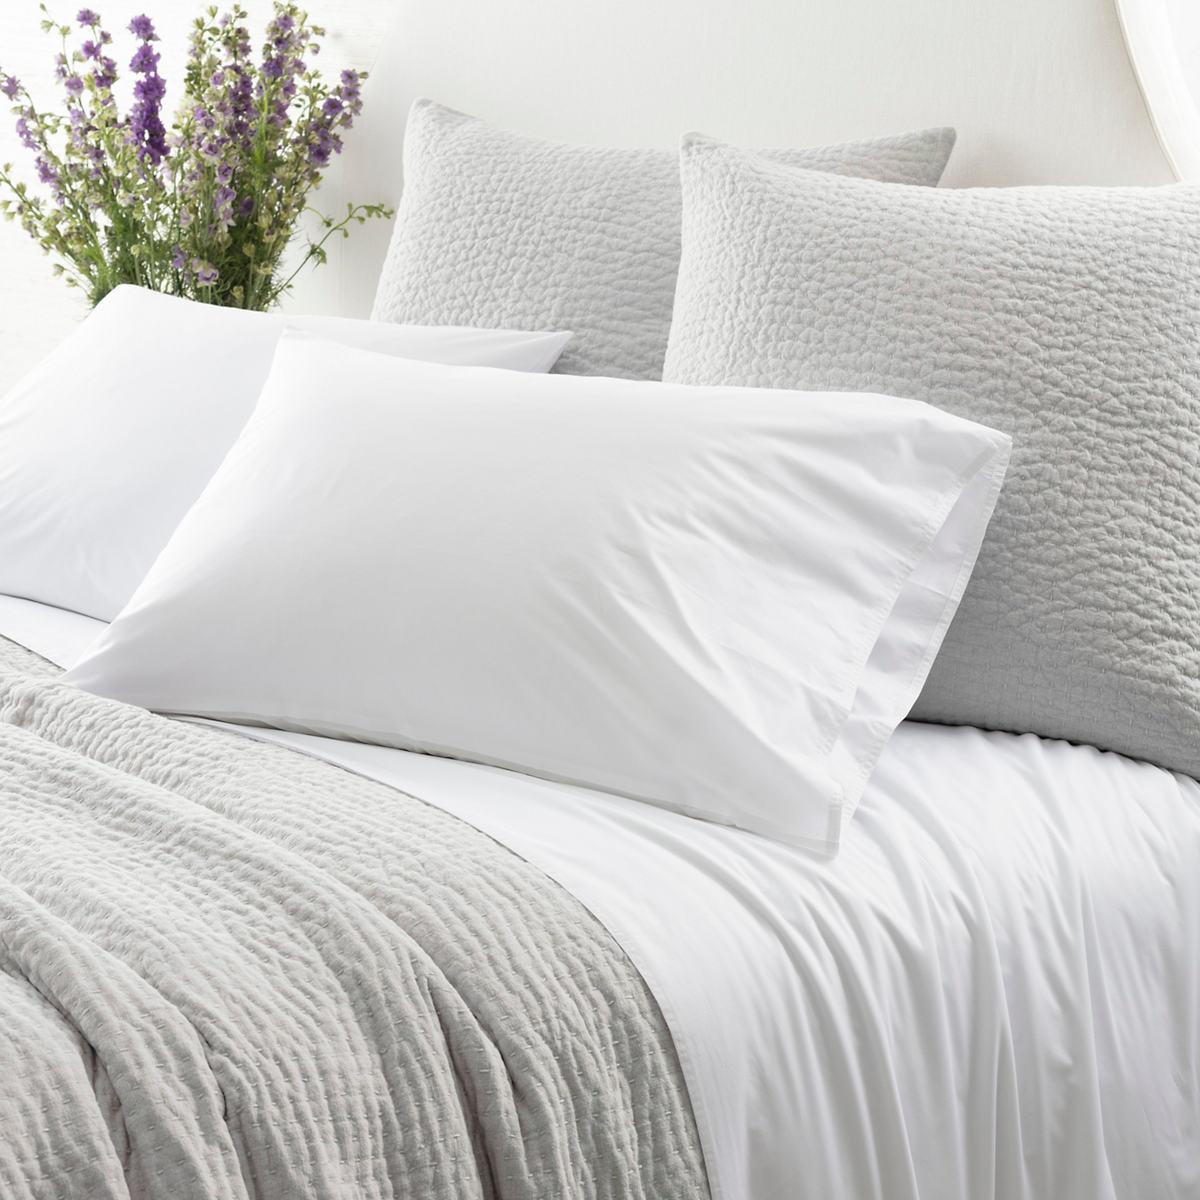 Laundered Hem White Sheet Set